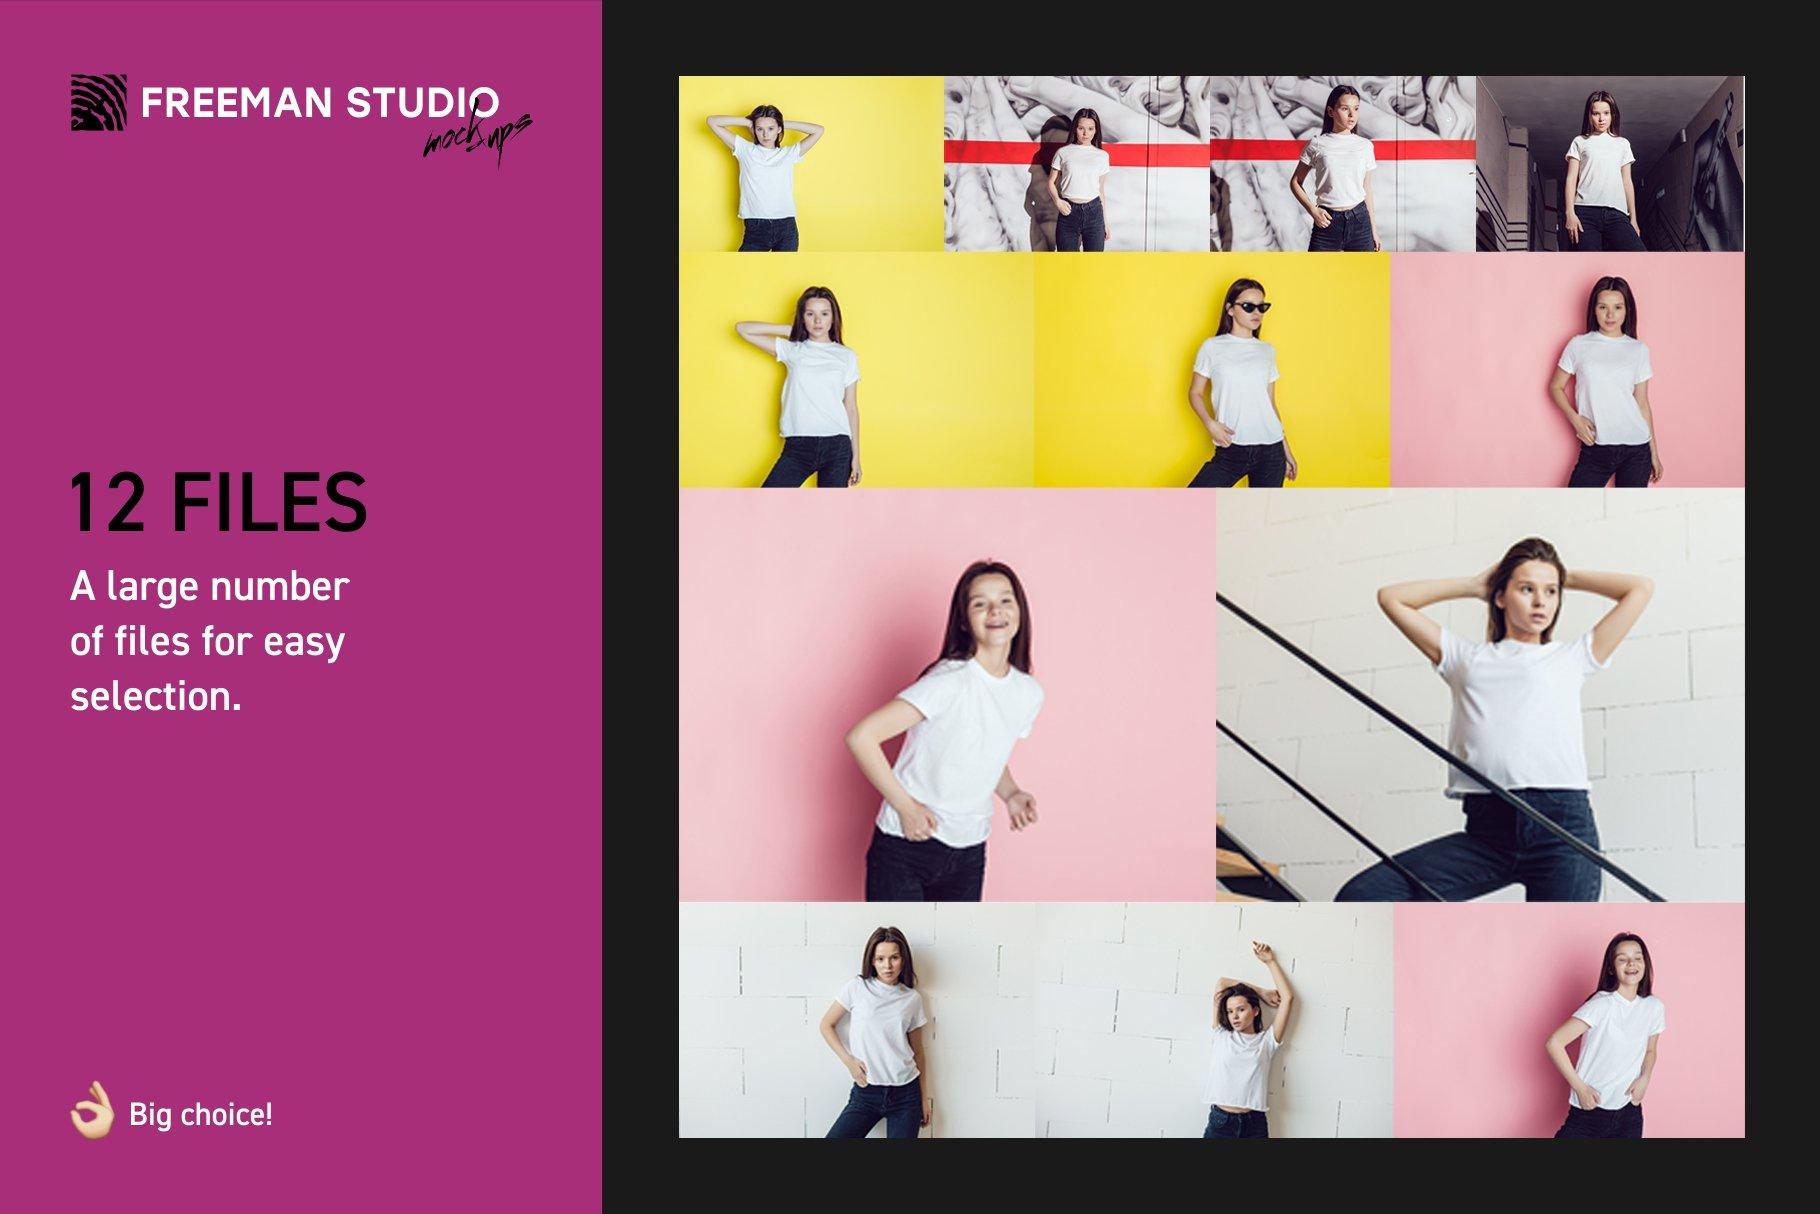 青少年T恤半袖衫印花图案设计展示样机合集 Teenager T-Shirt Mockup Set插图(1)